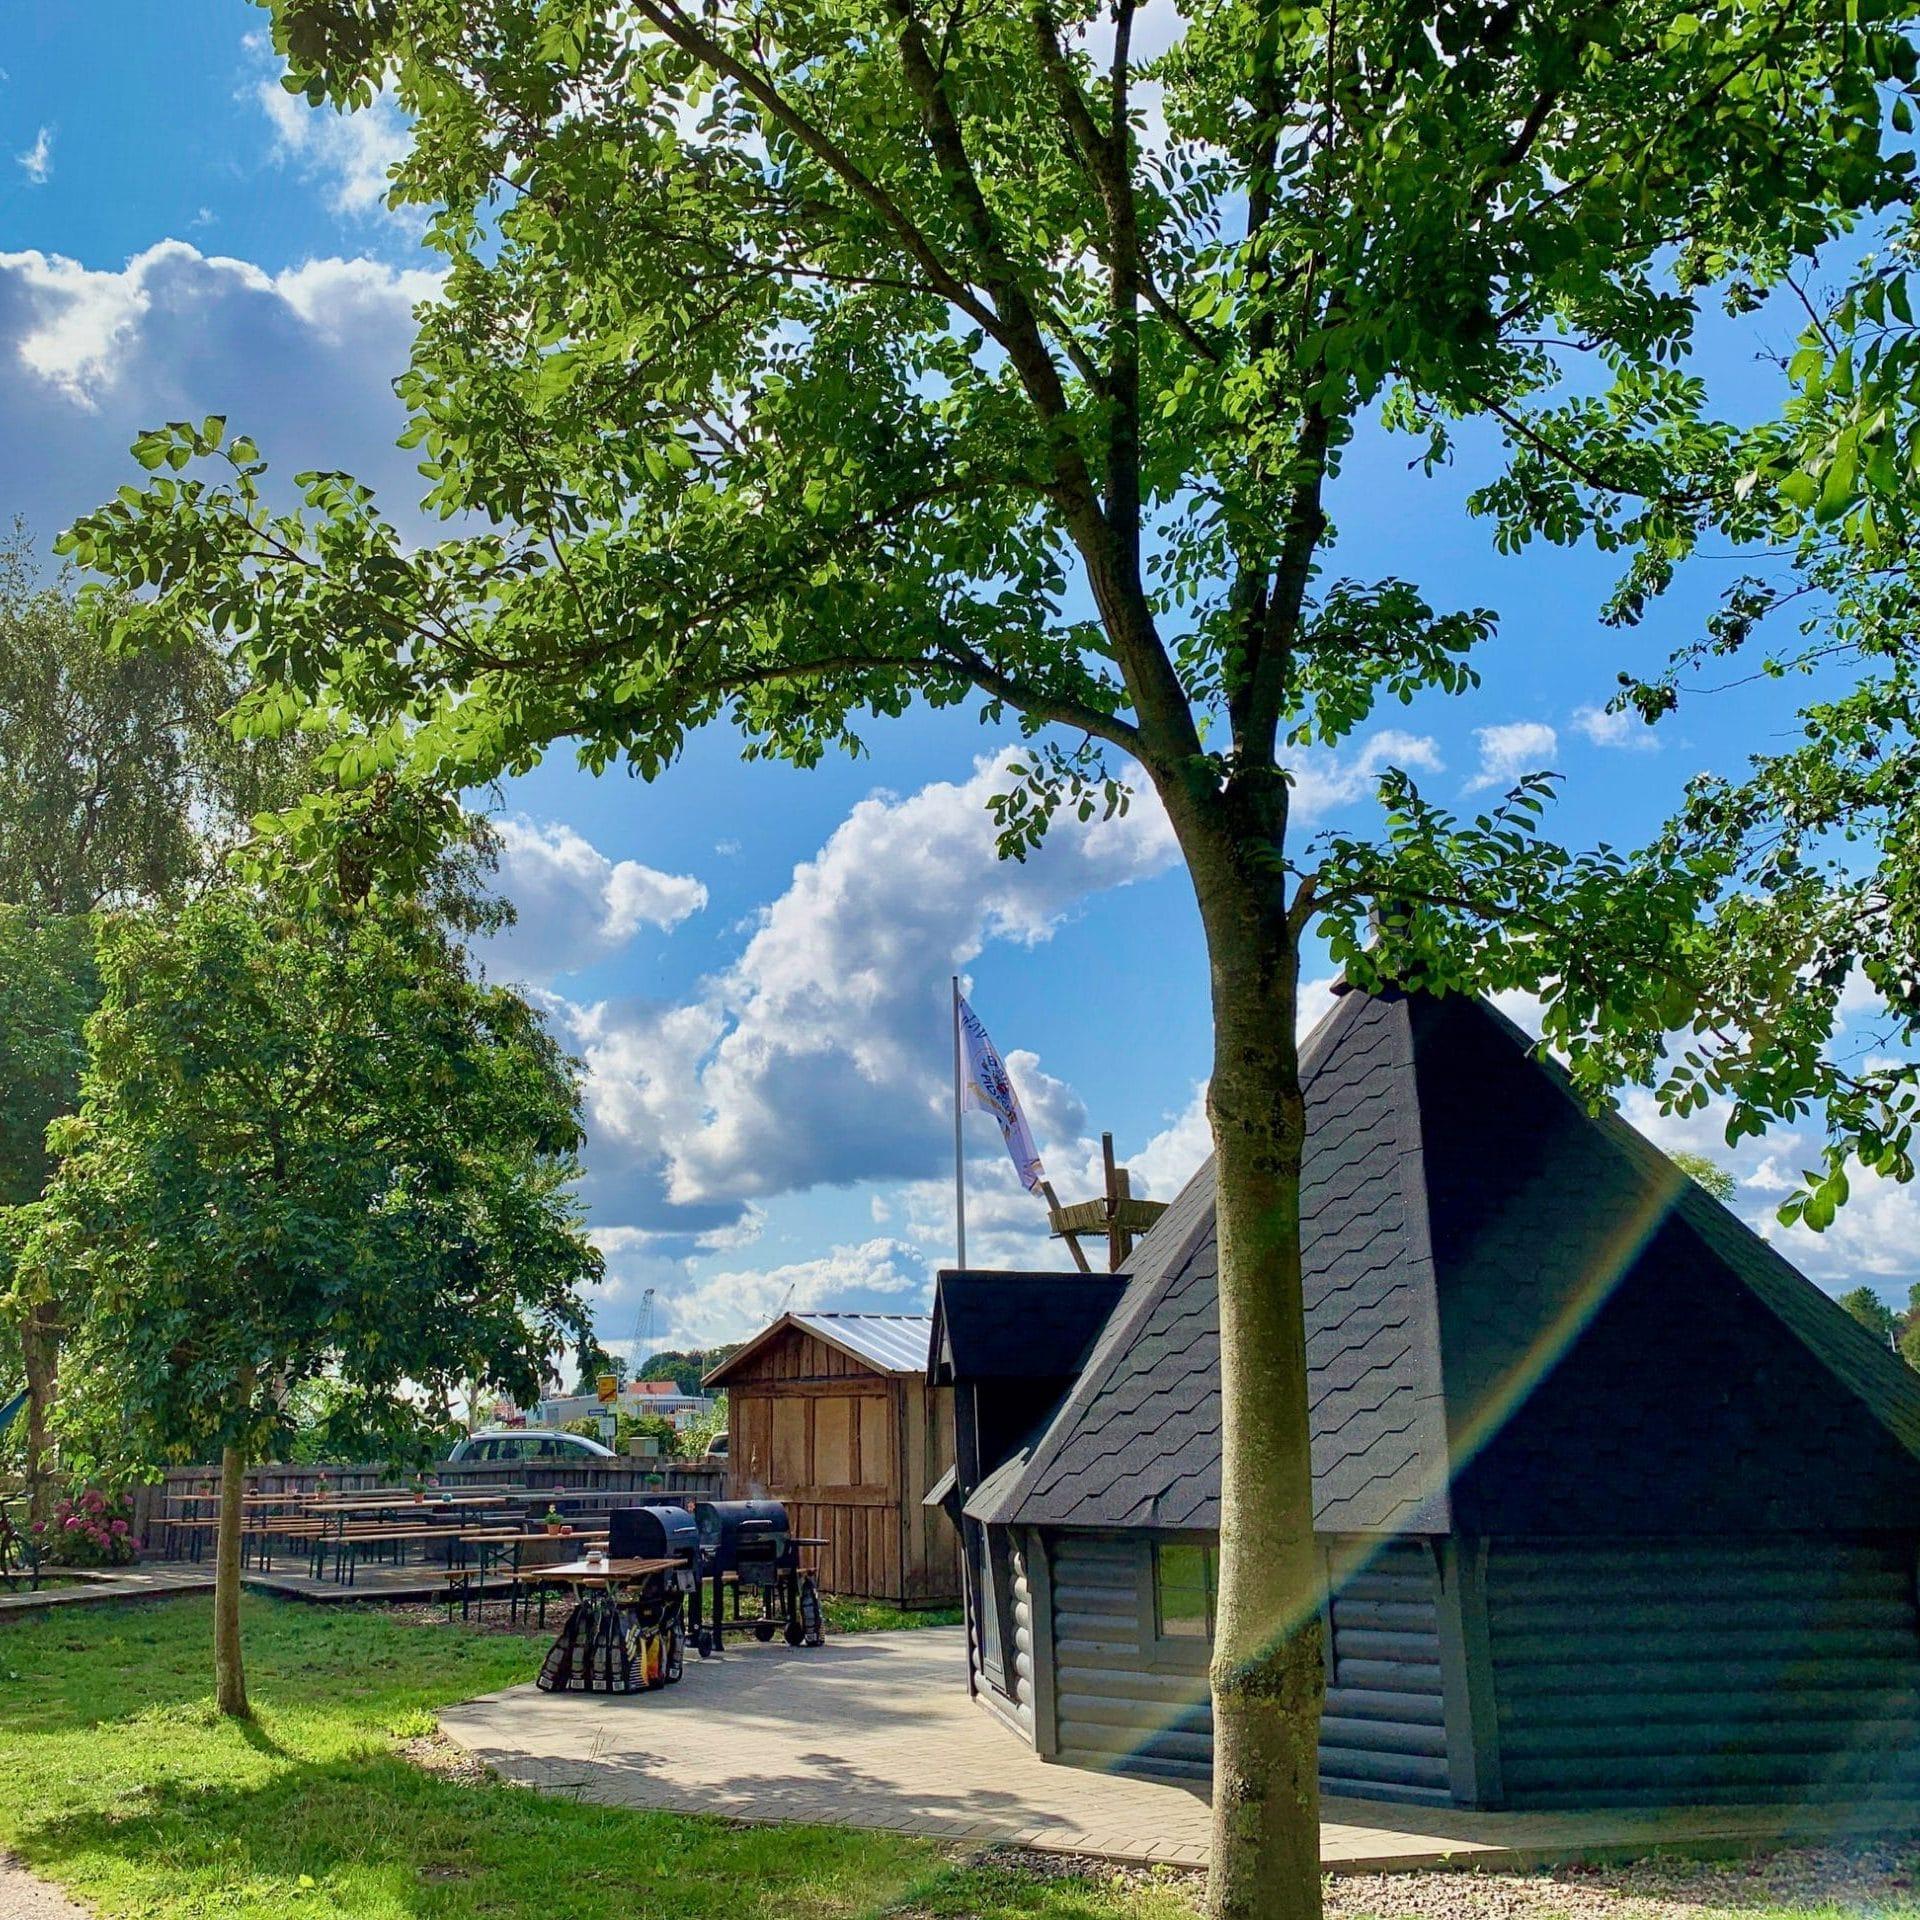 cropped Grillhütte Campfire Biergarten Cafe Schleiwelle Event Nature scaled 1